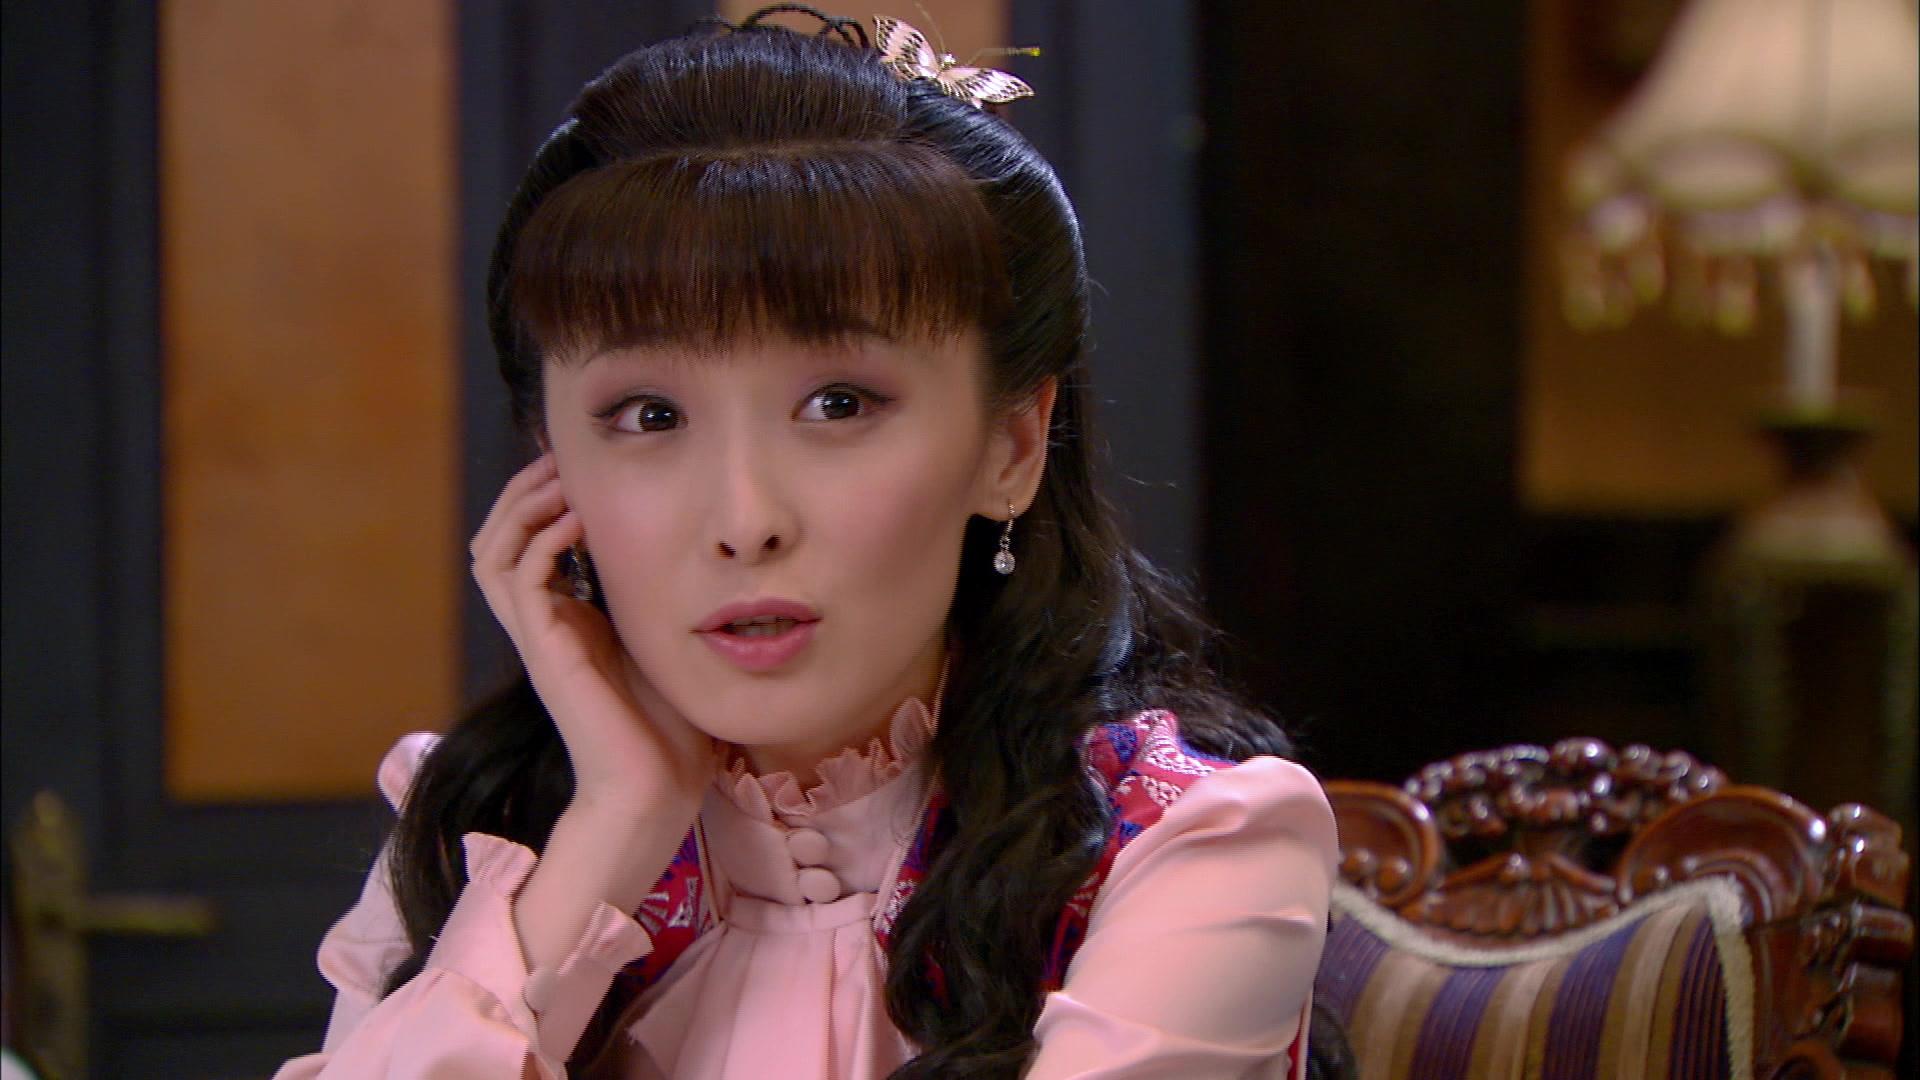 New Moment in Peking Episode 3